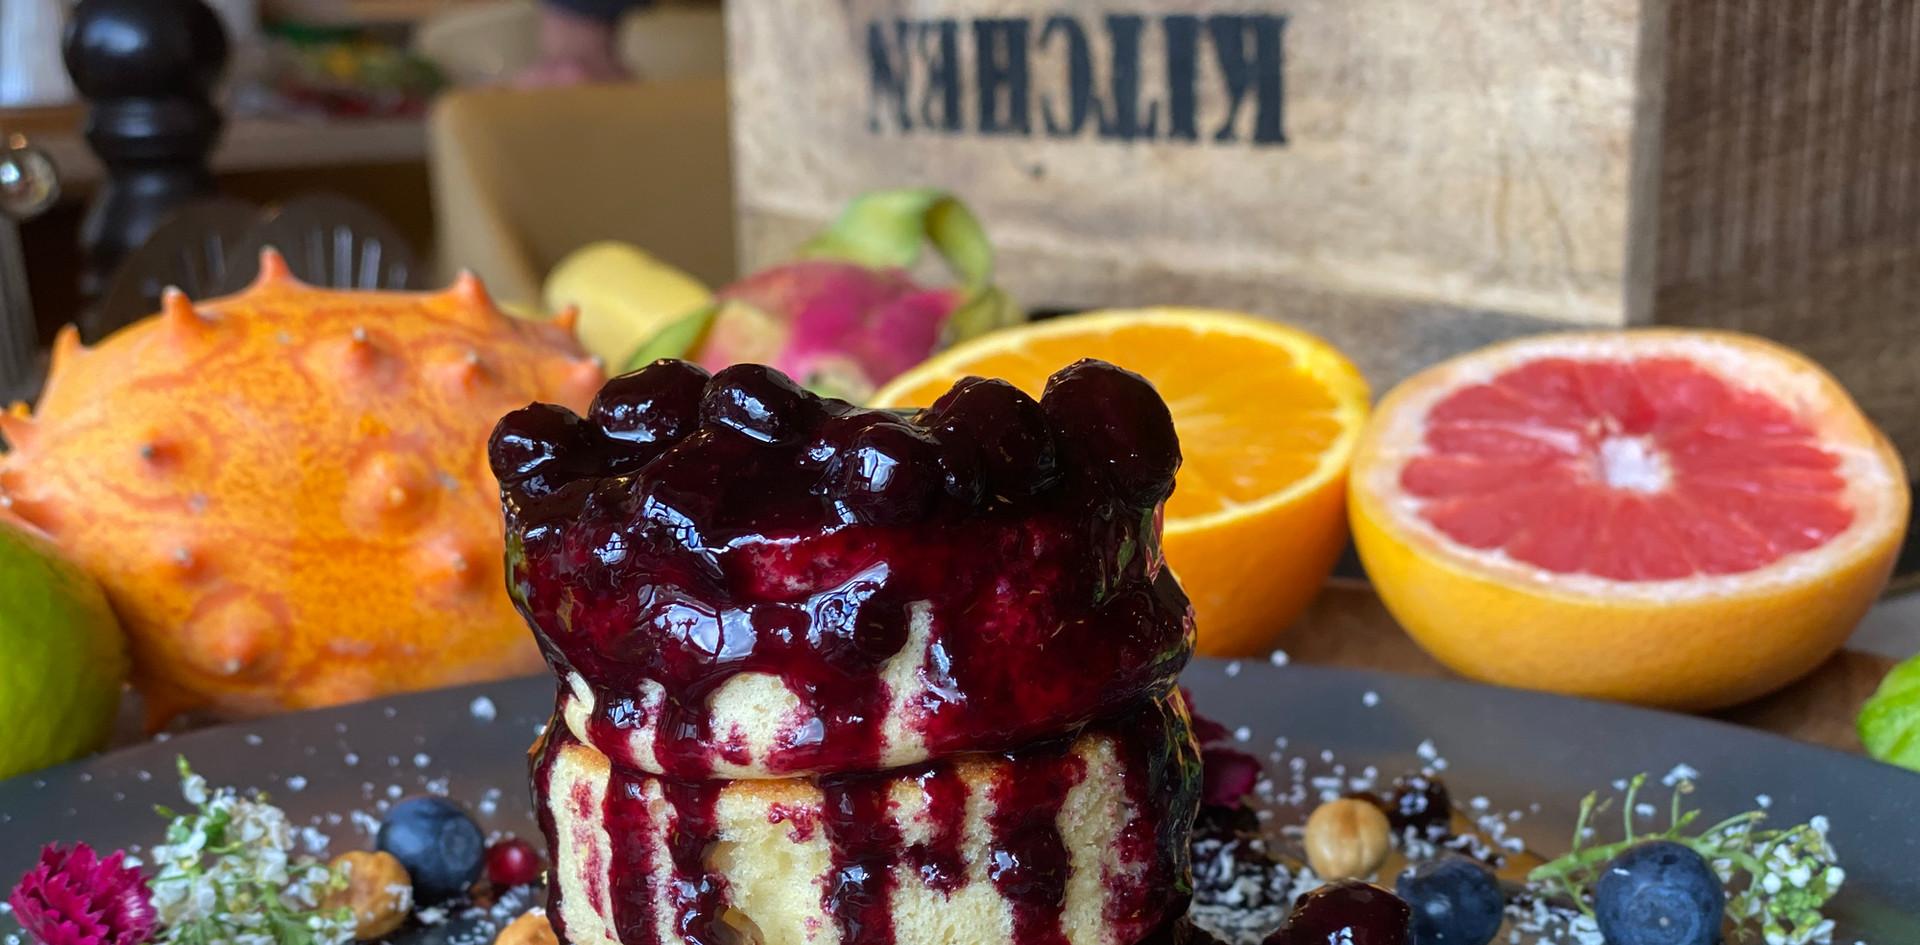 Blaubeer pancakes Frühstücks-Manufaktur - Hotel Wegner - The culinary Art Hotel